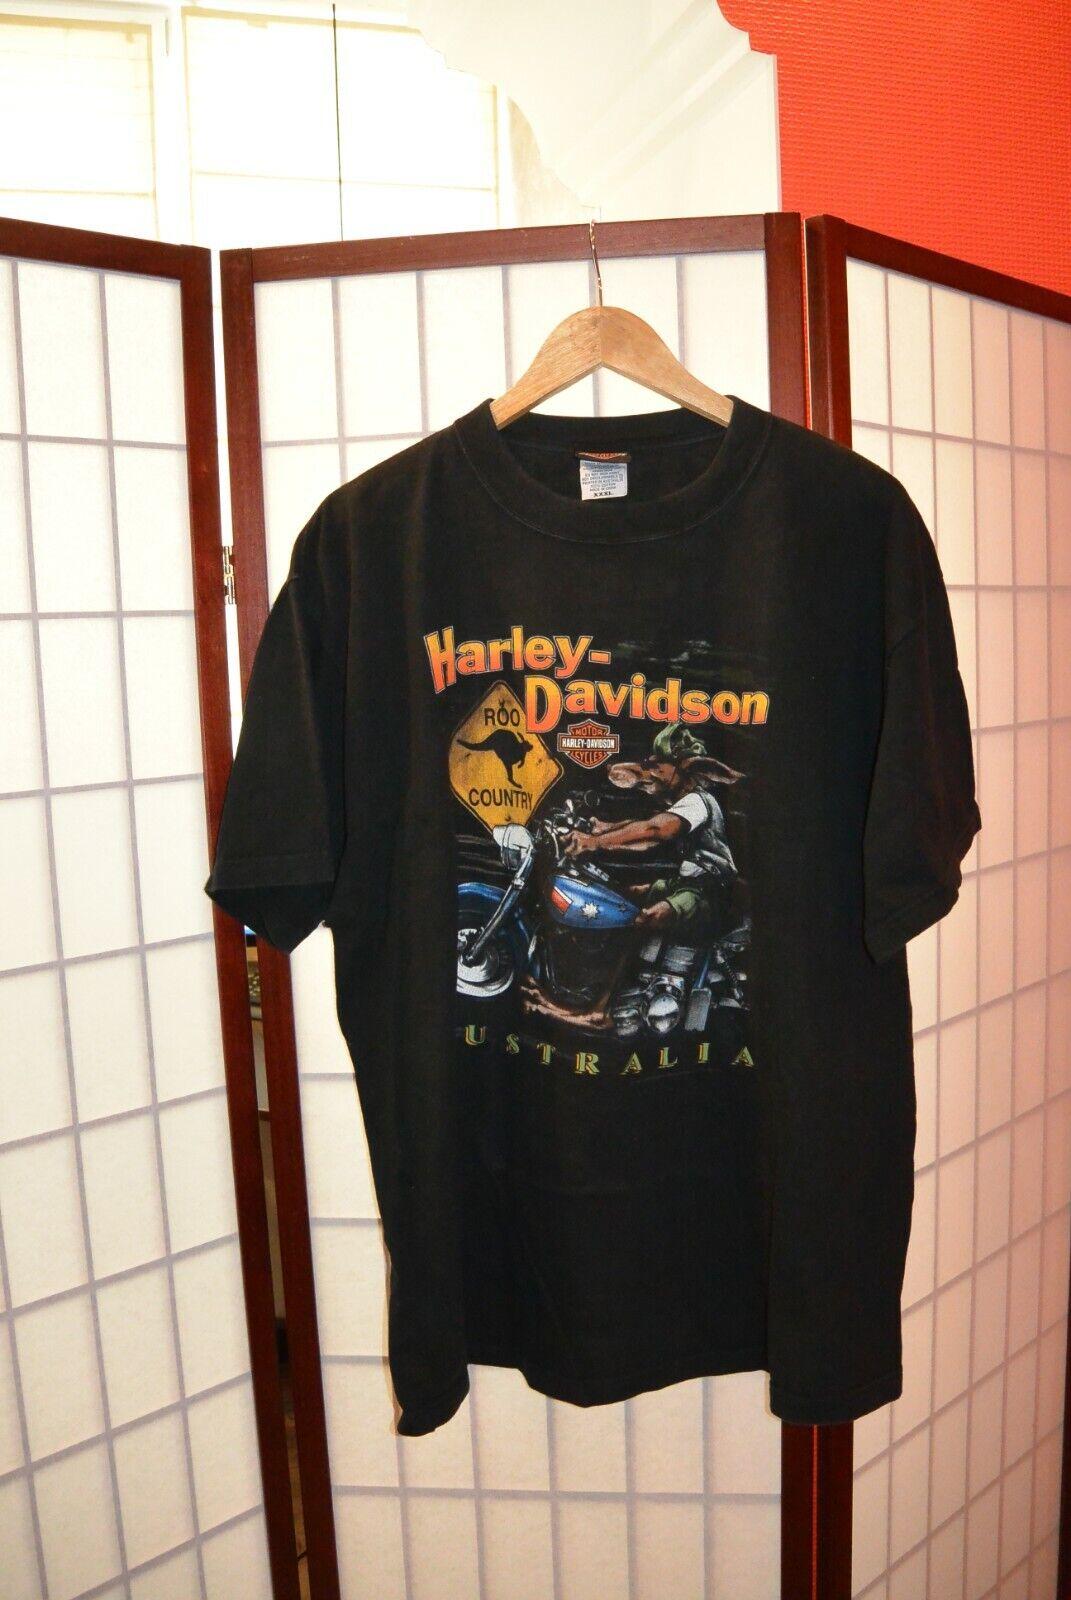 Harley Davidson Australia Country Roo 1997 tee shirt XXXL 3 XL